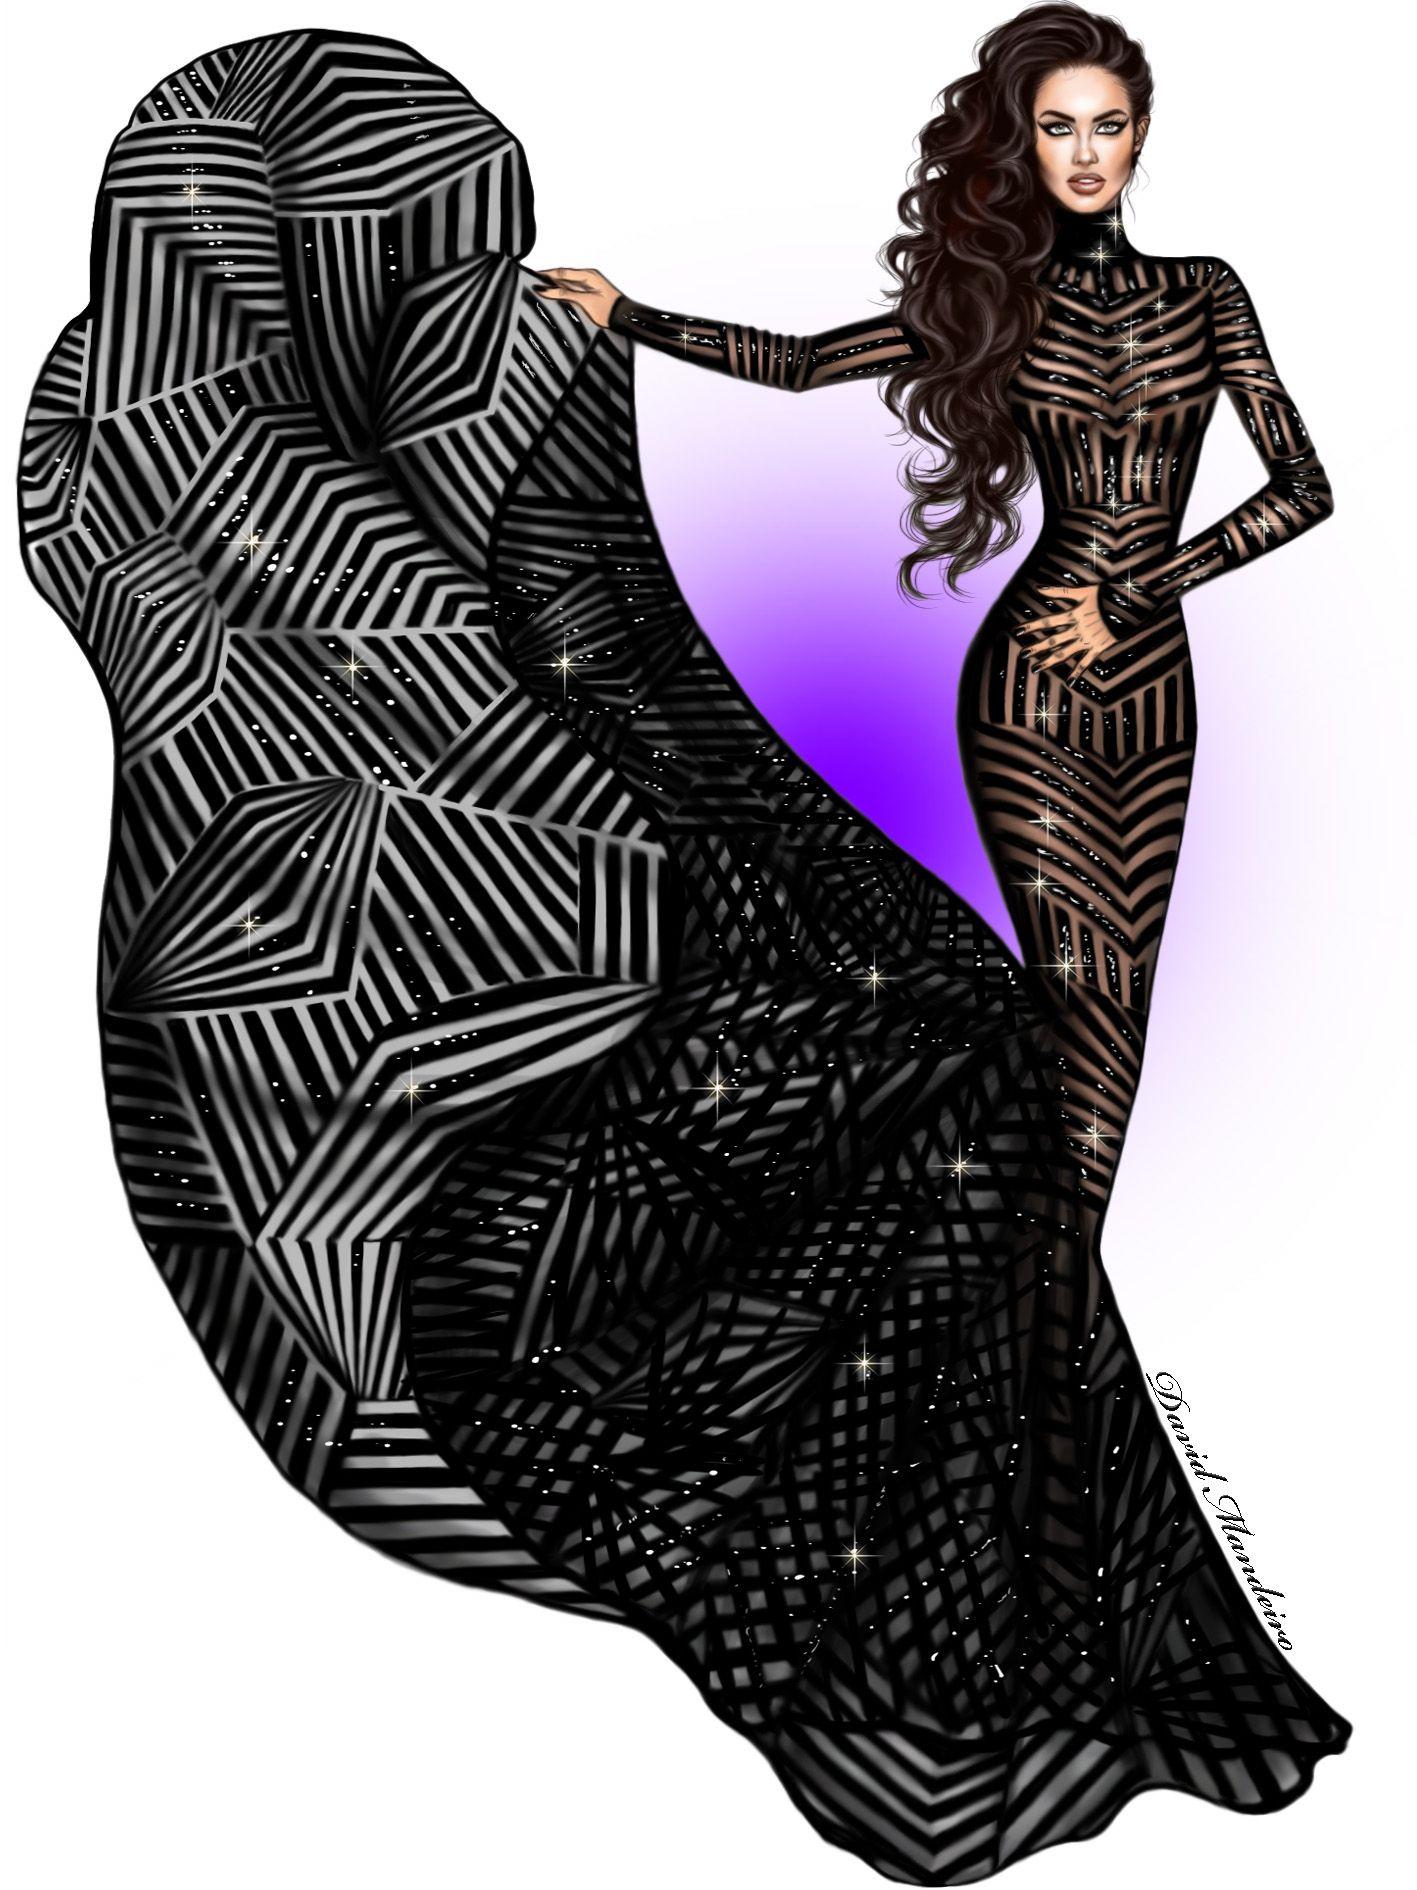 #digitaldrawing By David Mandeiro Illustrations Wacom